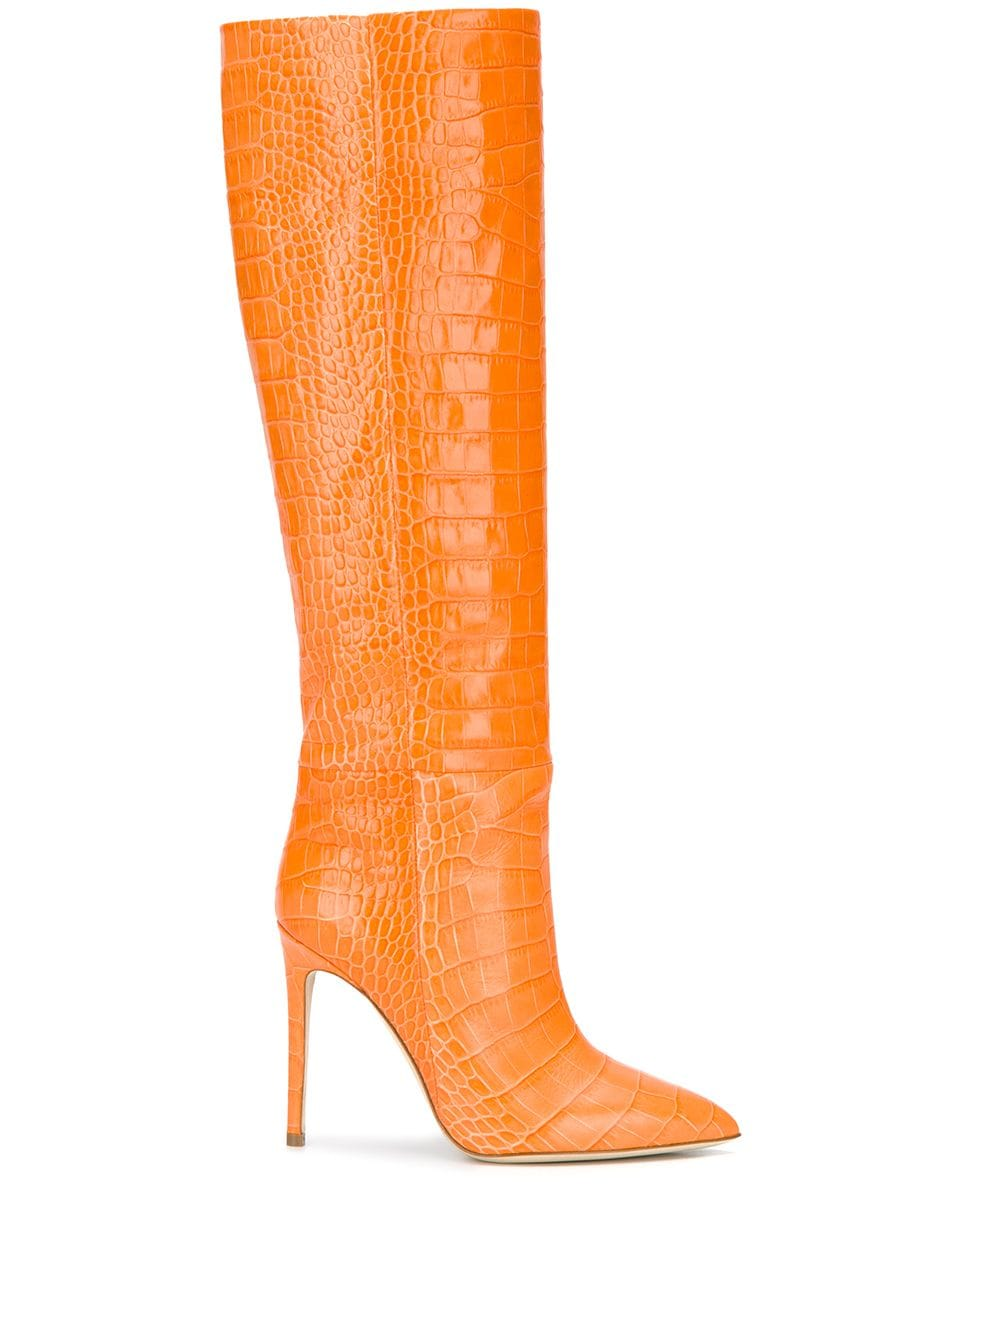 kylie jenner boot orange